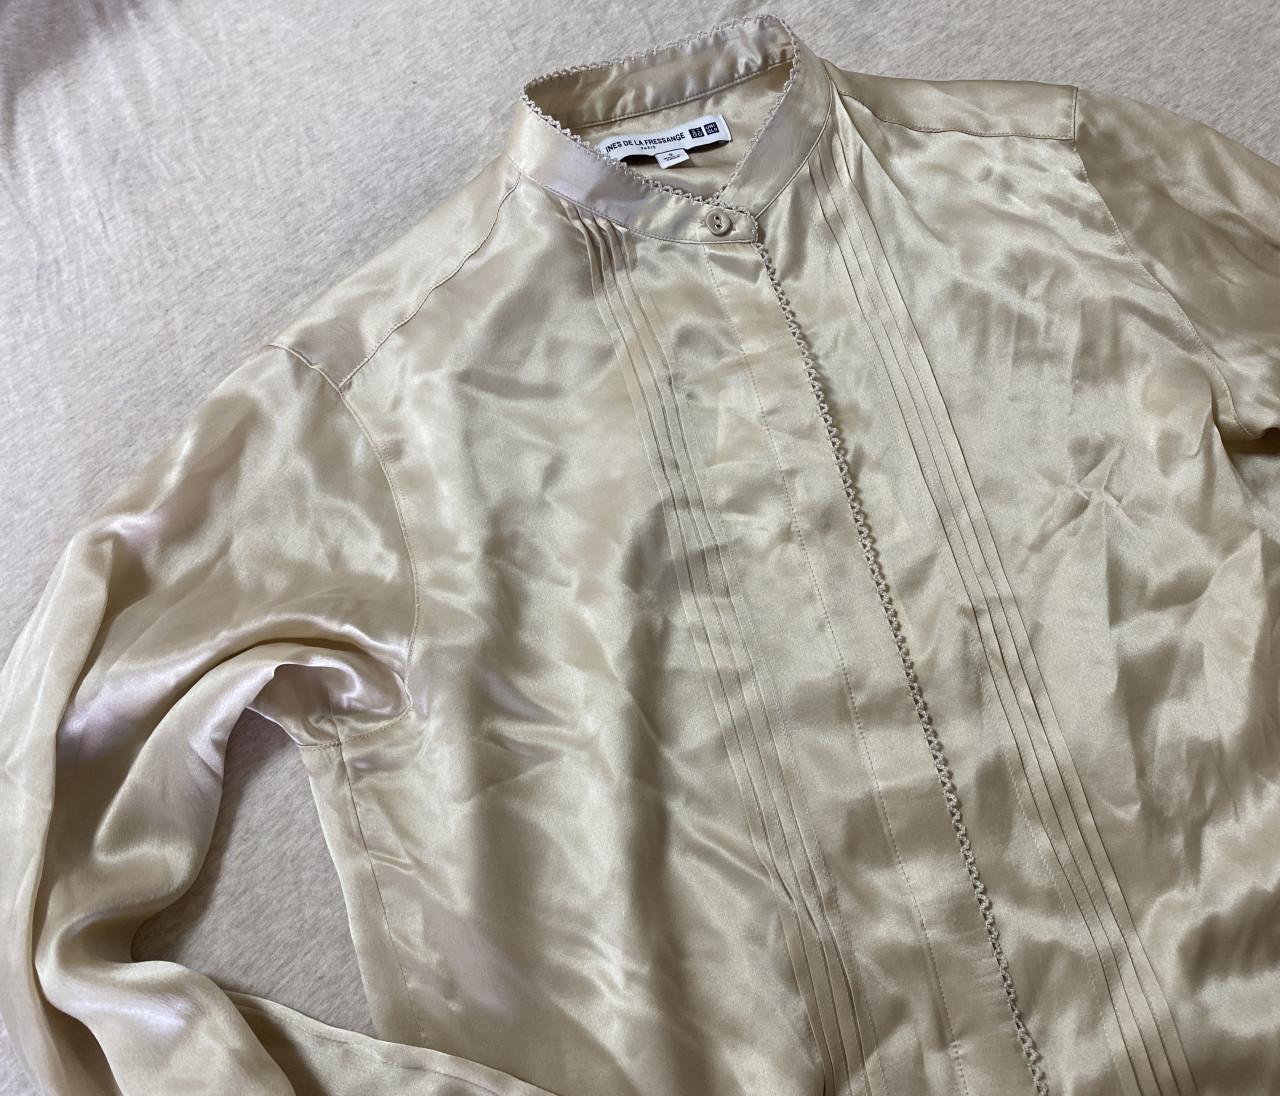 【UNIQLO】100%シルクシャツが7000円で買える⁉